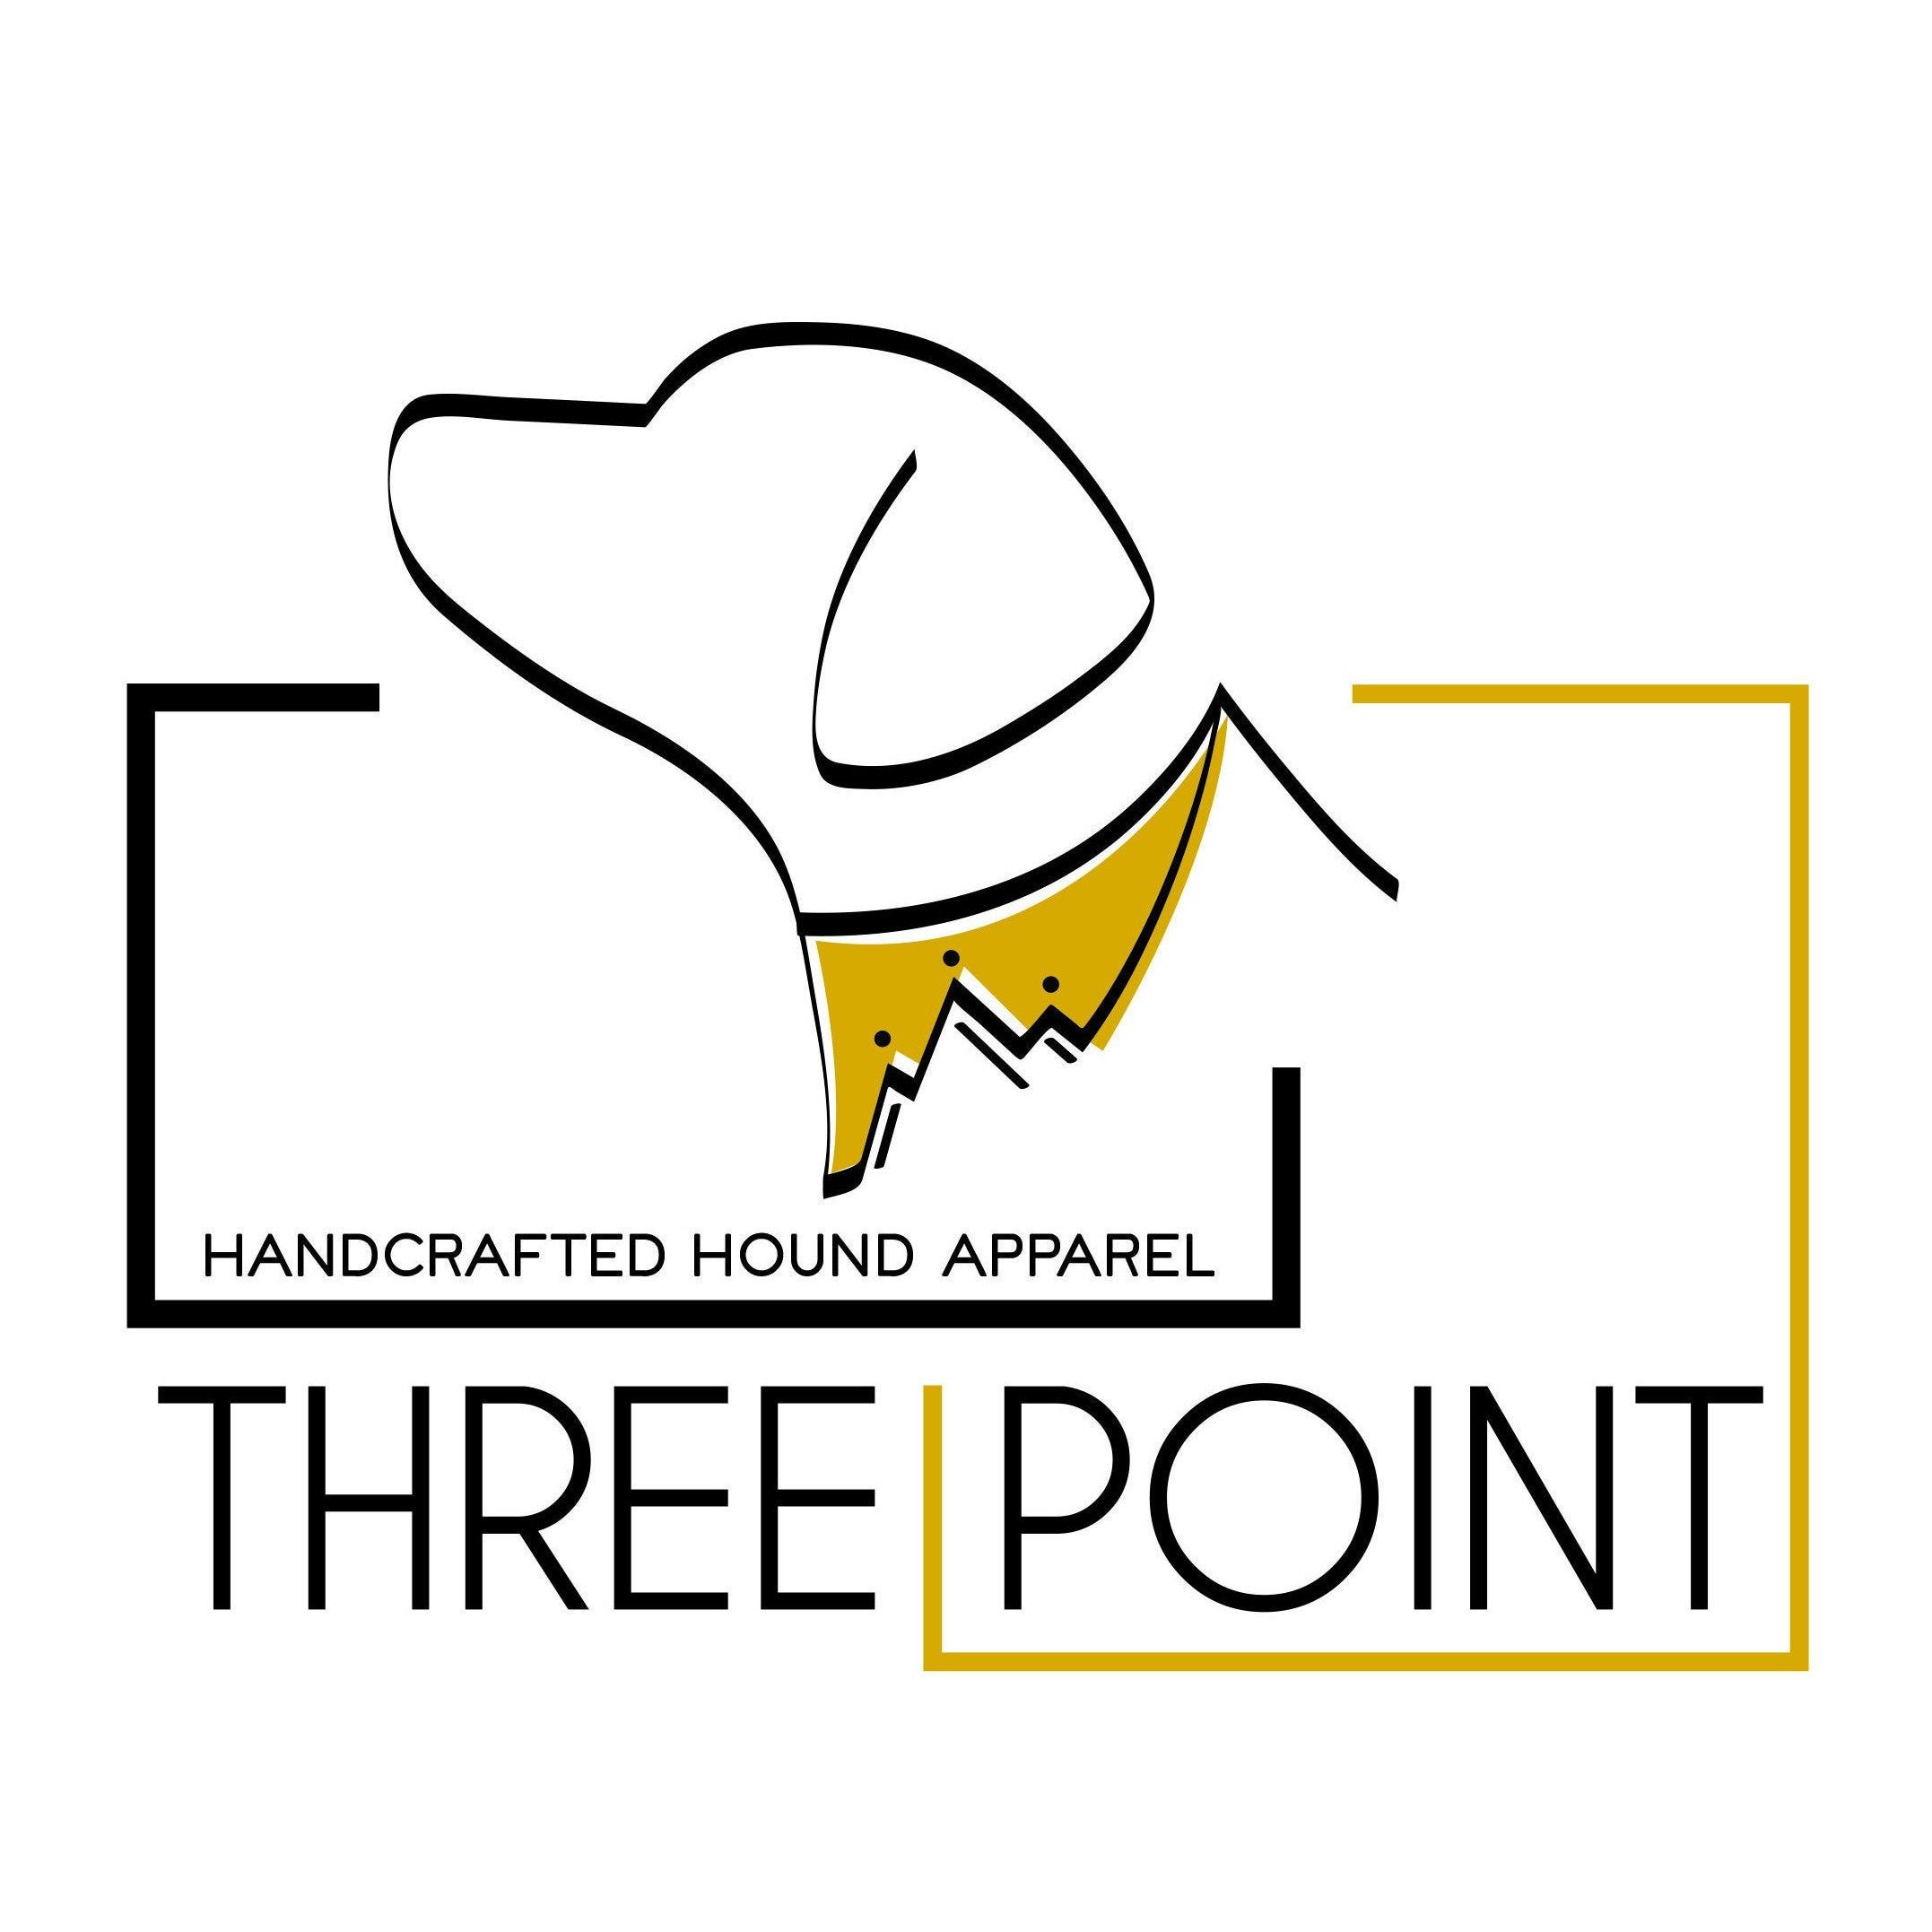 THREE POINT HOUND Cotton Candy Peaks Dog Bandana